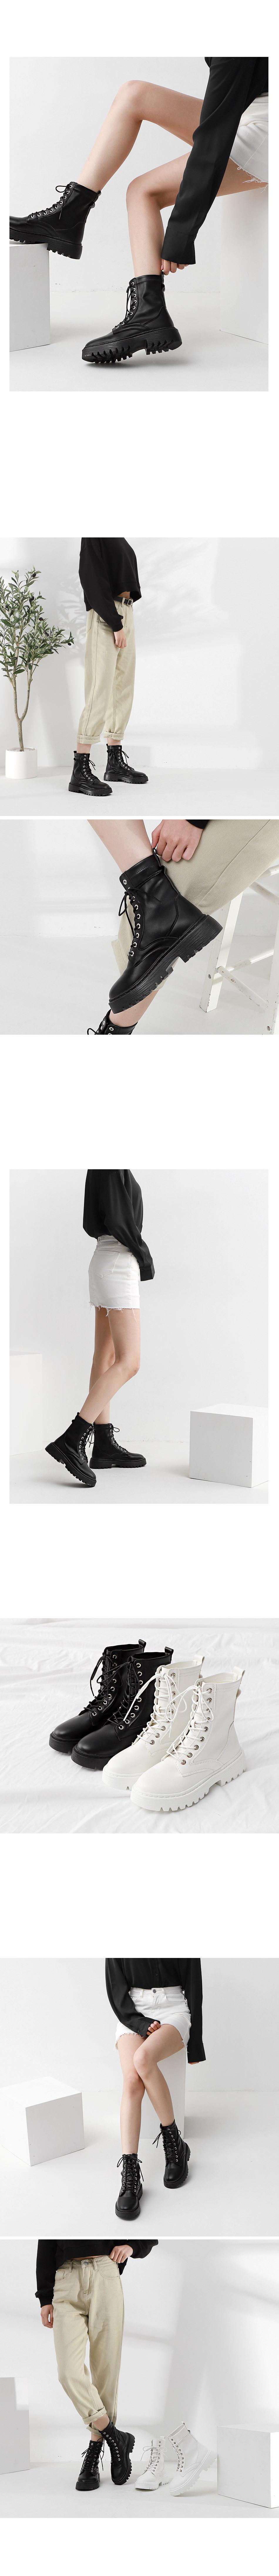 Isshu Lace-up Simple Lightweight Full Heel Walker Boots 10820